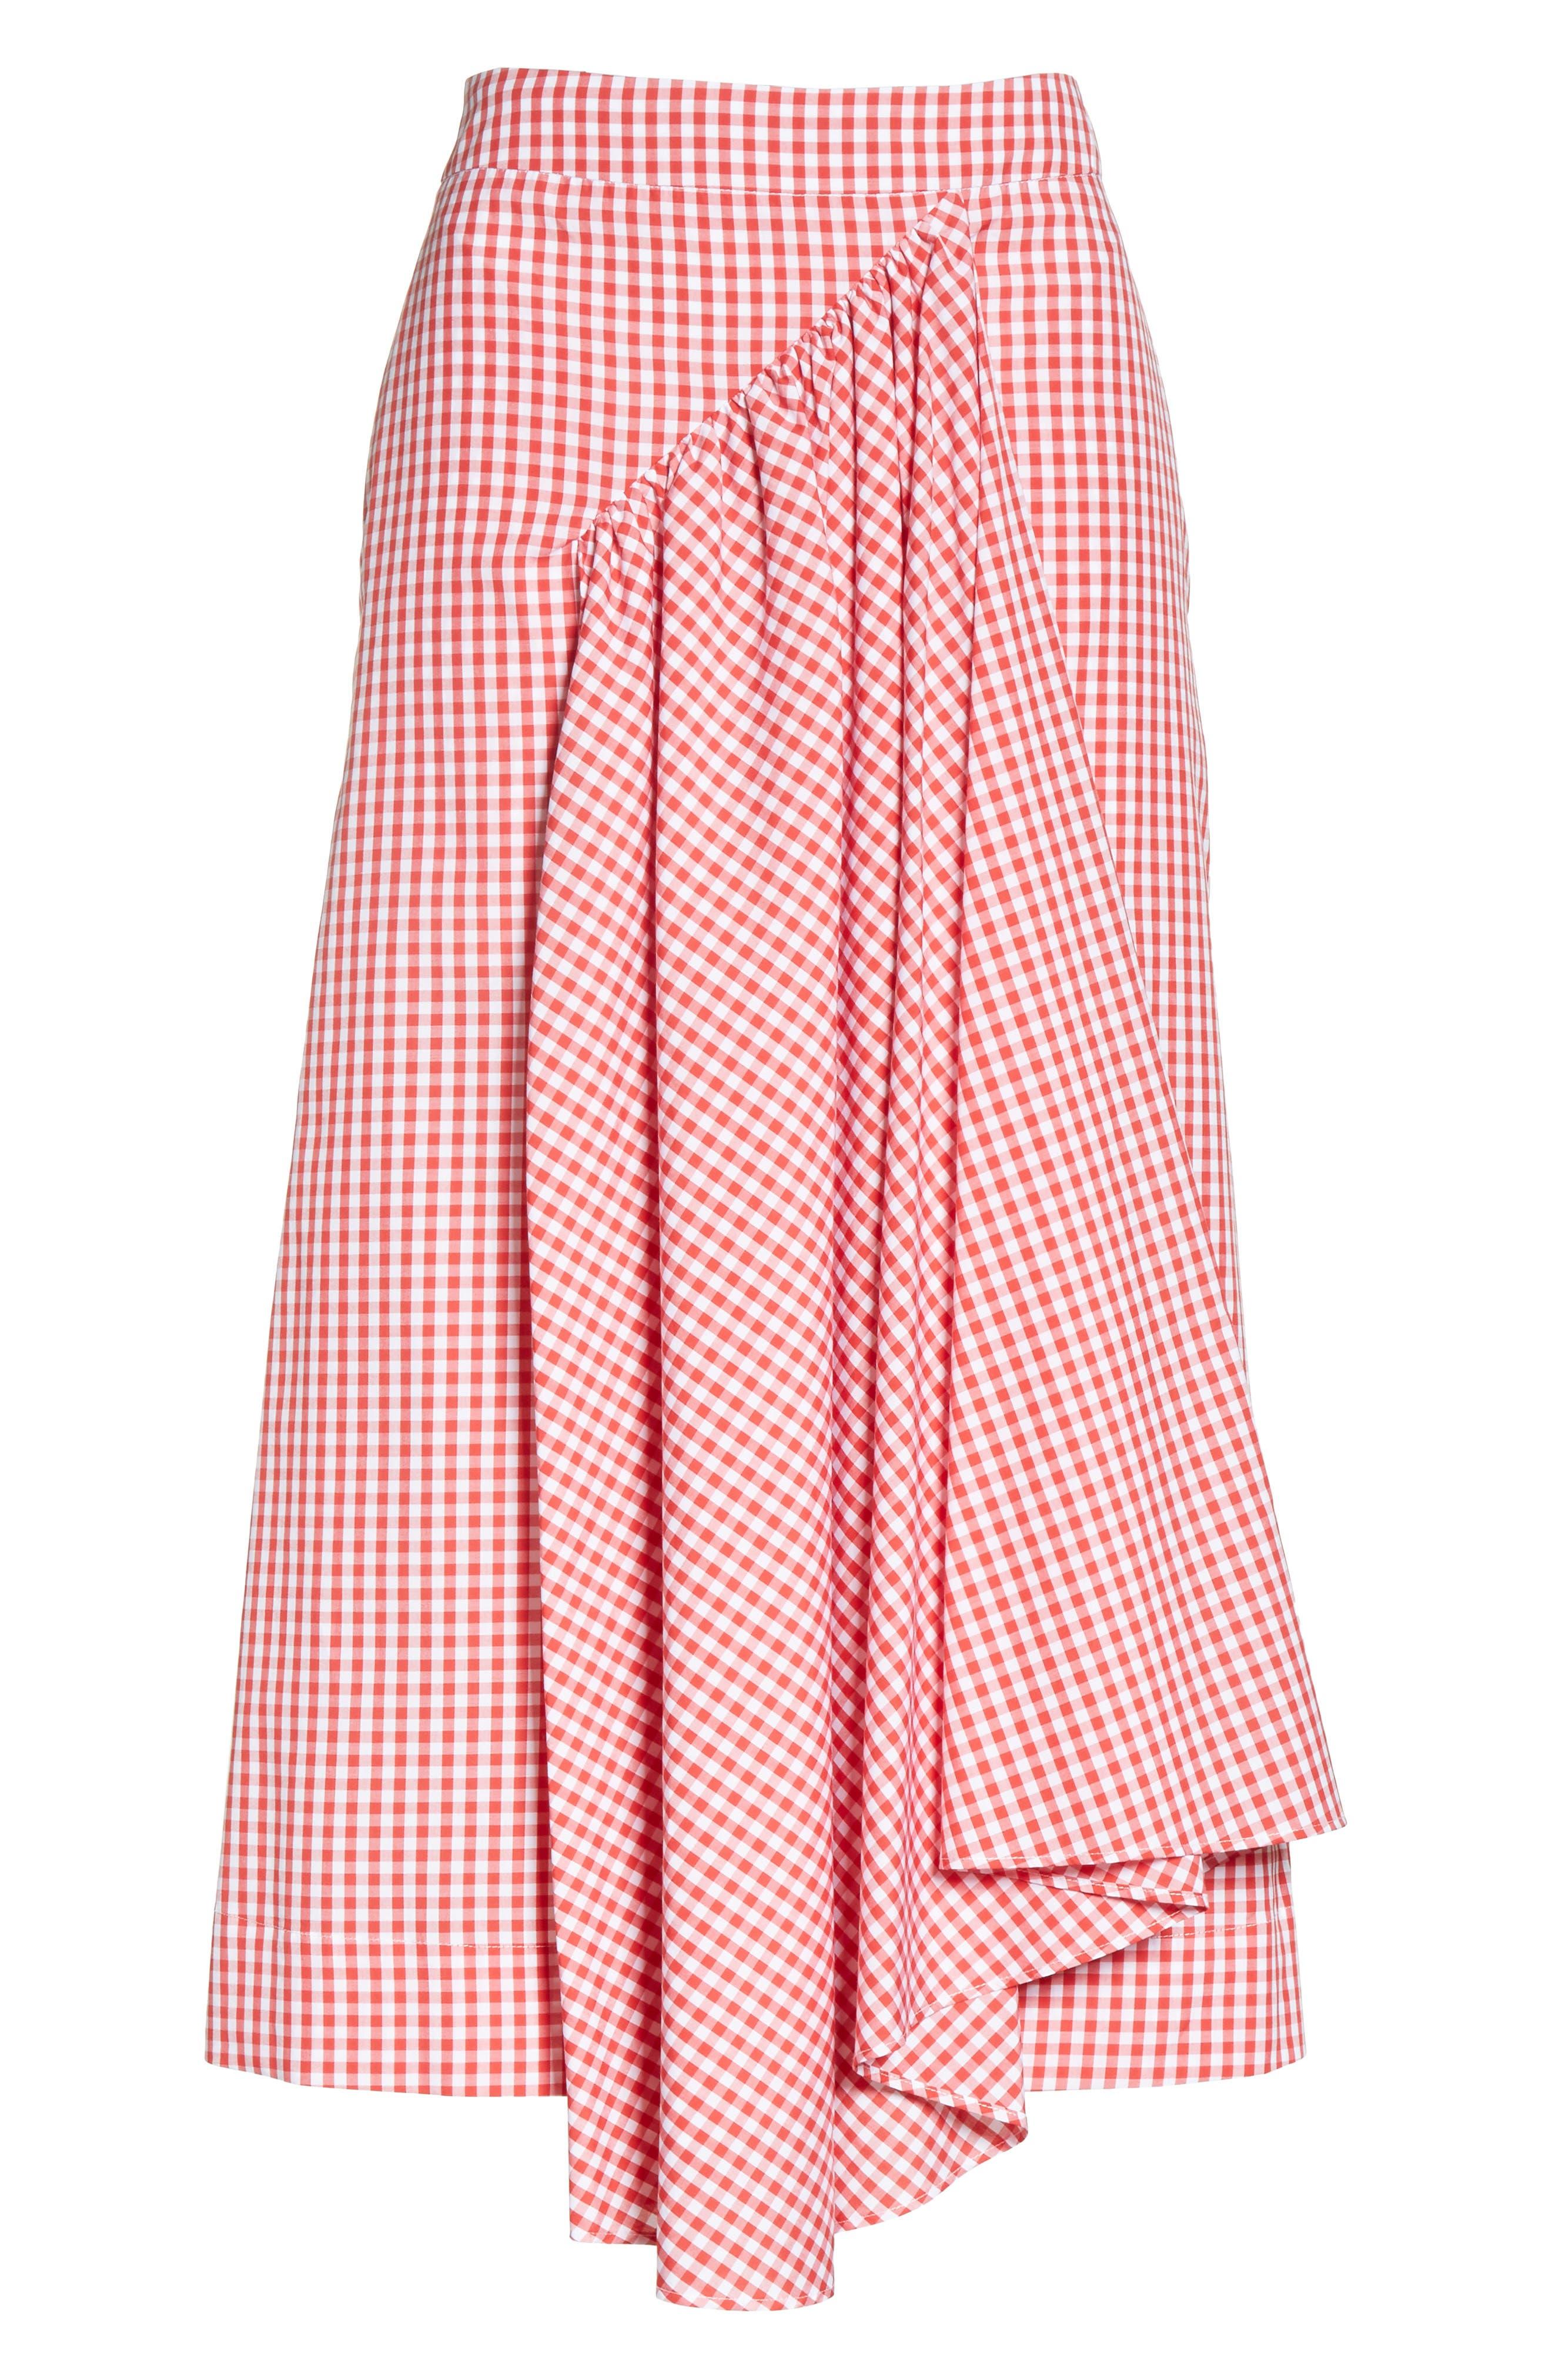 Three-Panel Gingham Midi Skirt,                             Main thumbnail 1, color,                             Red/ White